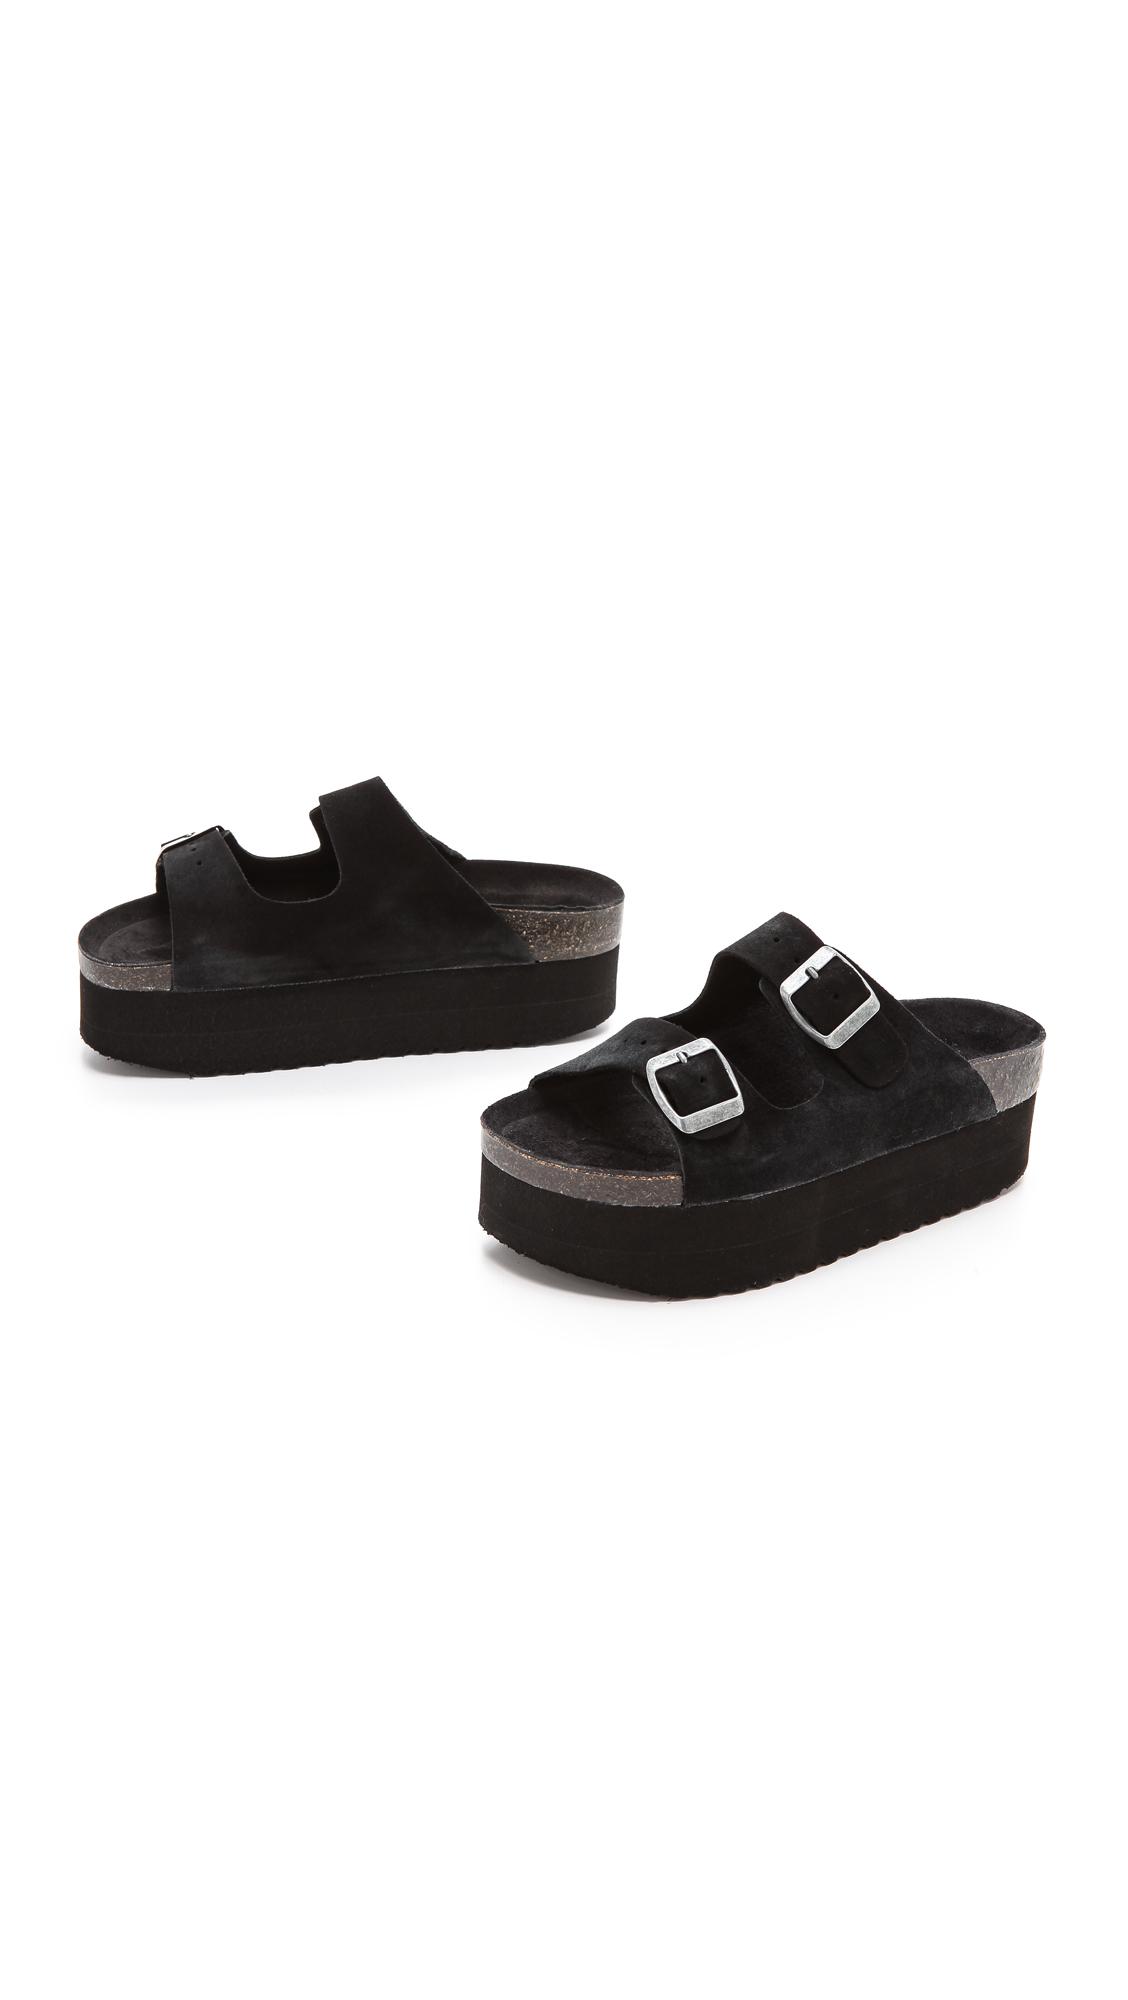 d97410d0d6f7 Jeffrey Campbell Aurelia Platform Sandals